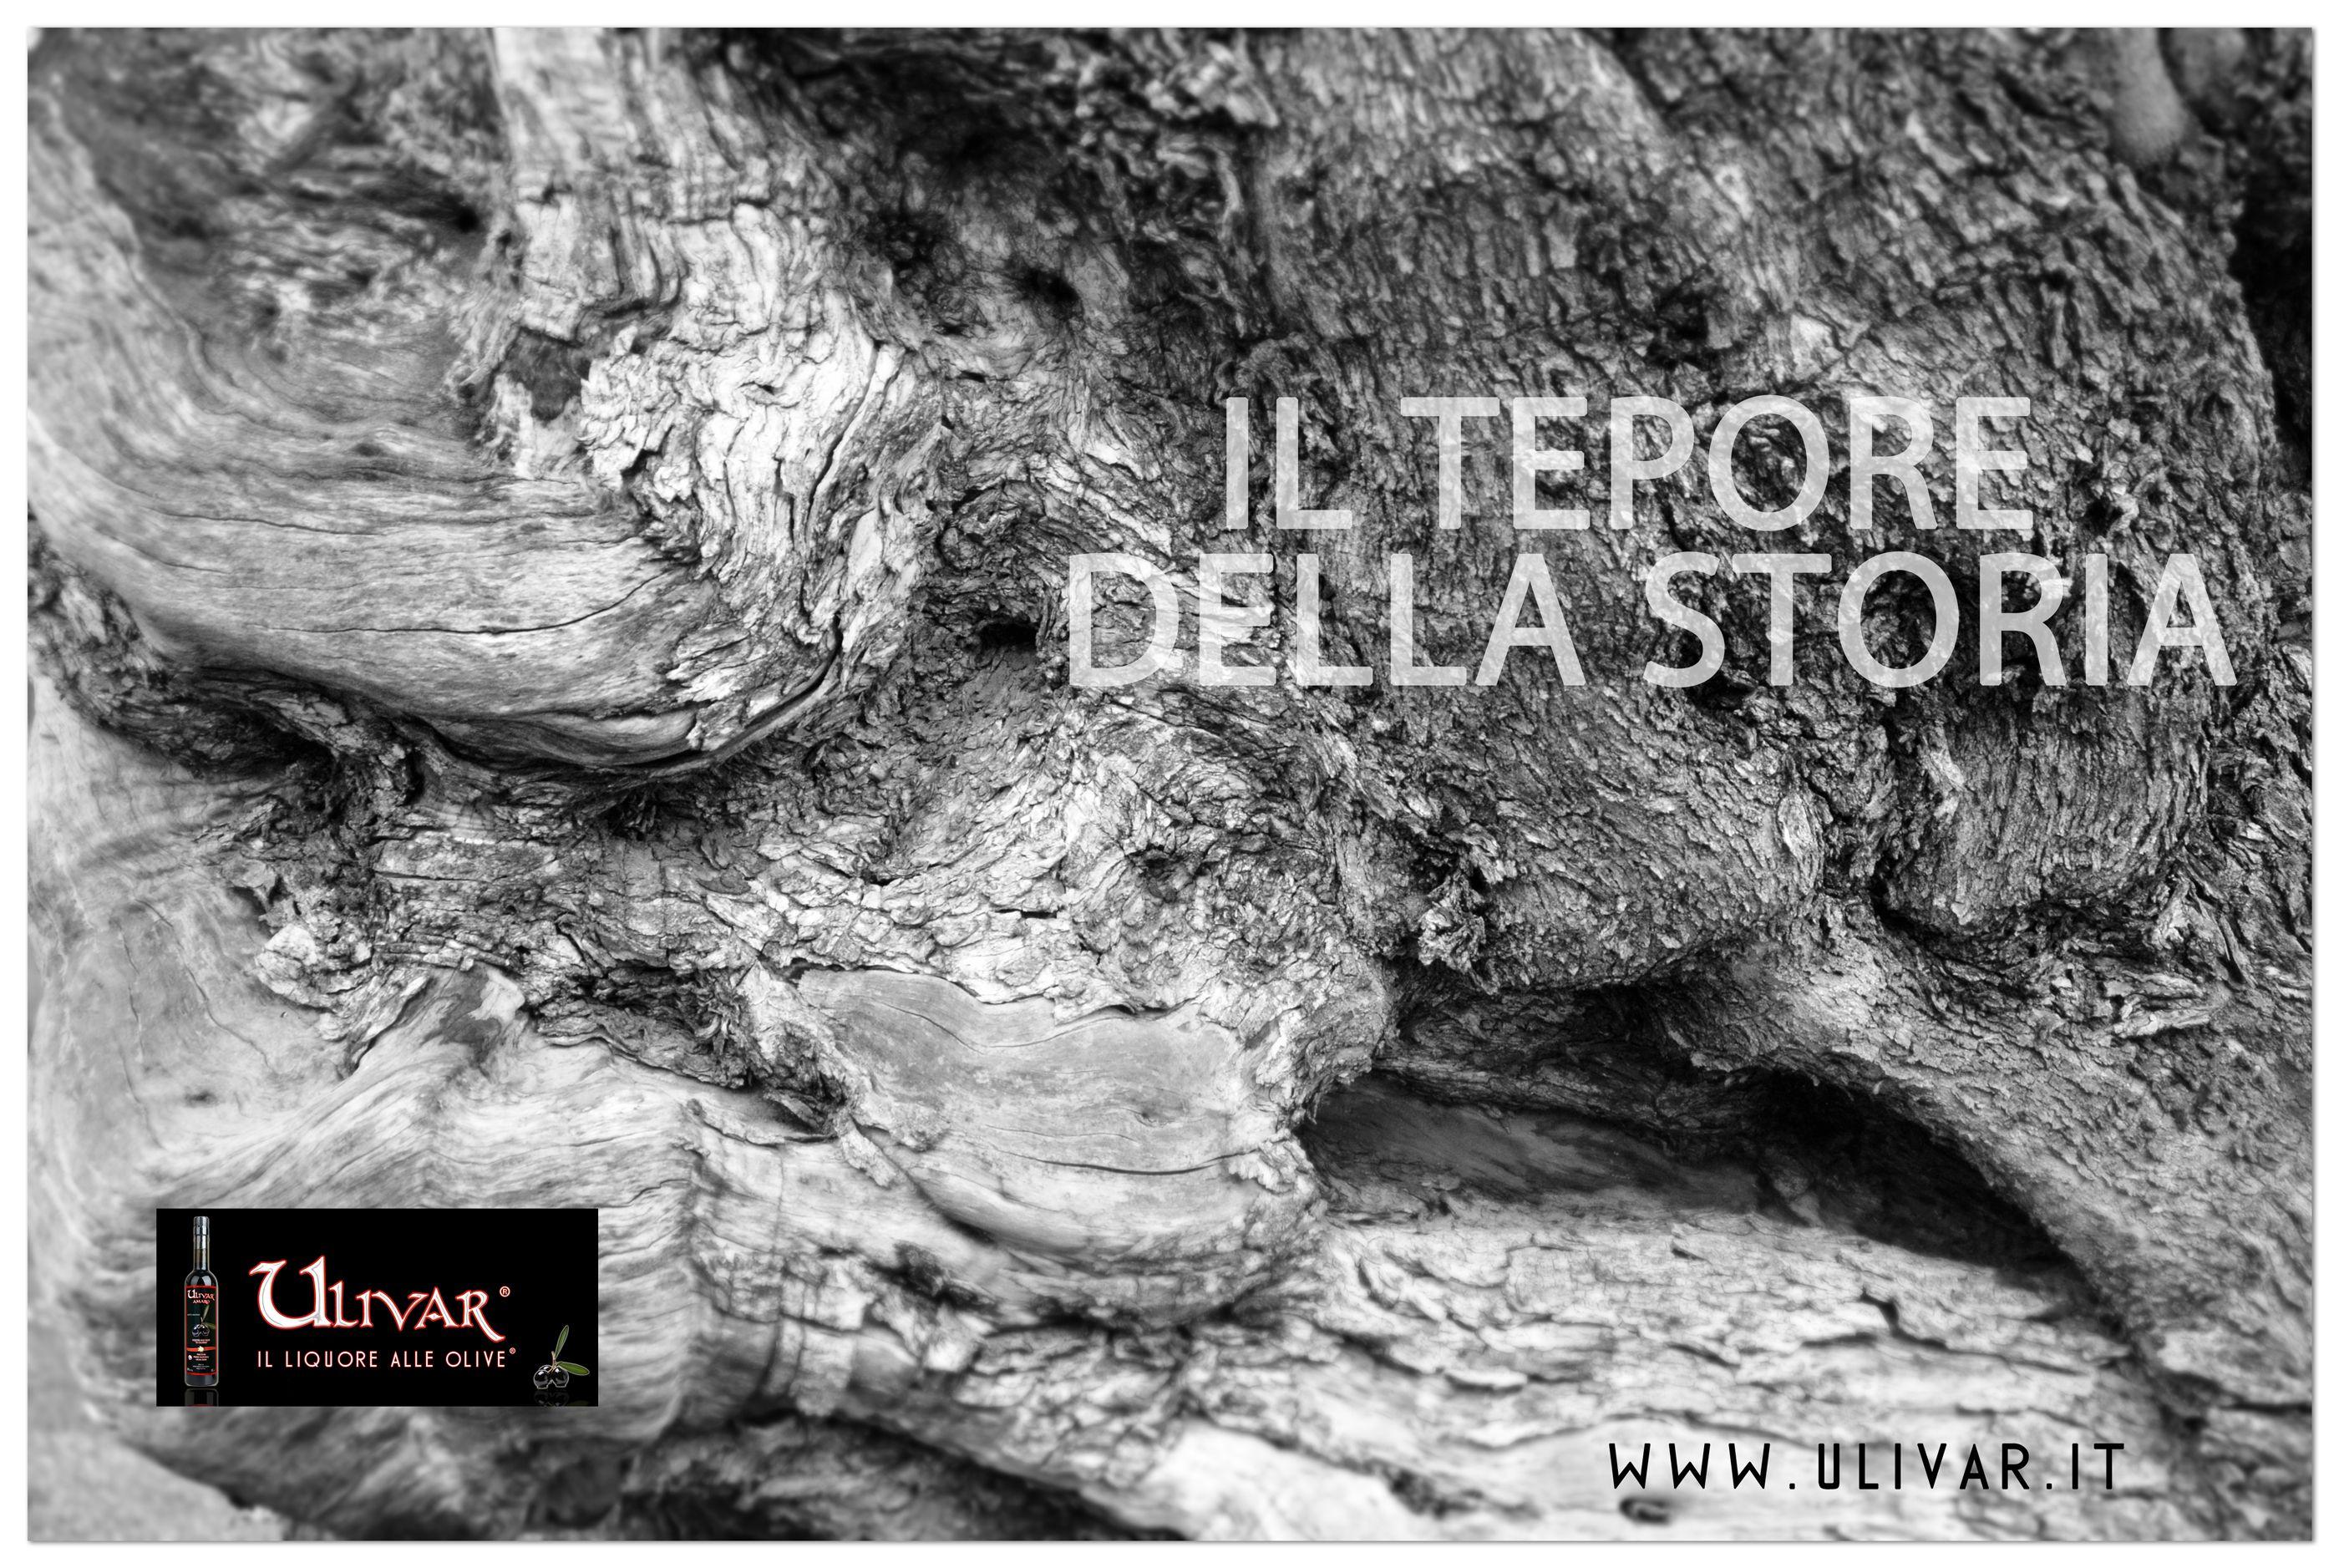 #ilteporedellastoria #zeroaromi #liquorealleolive